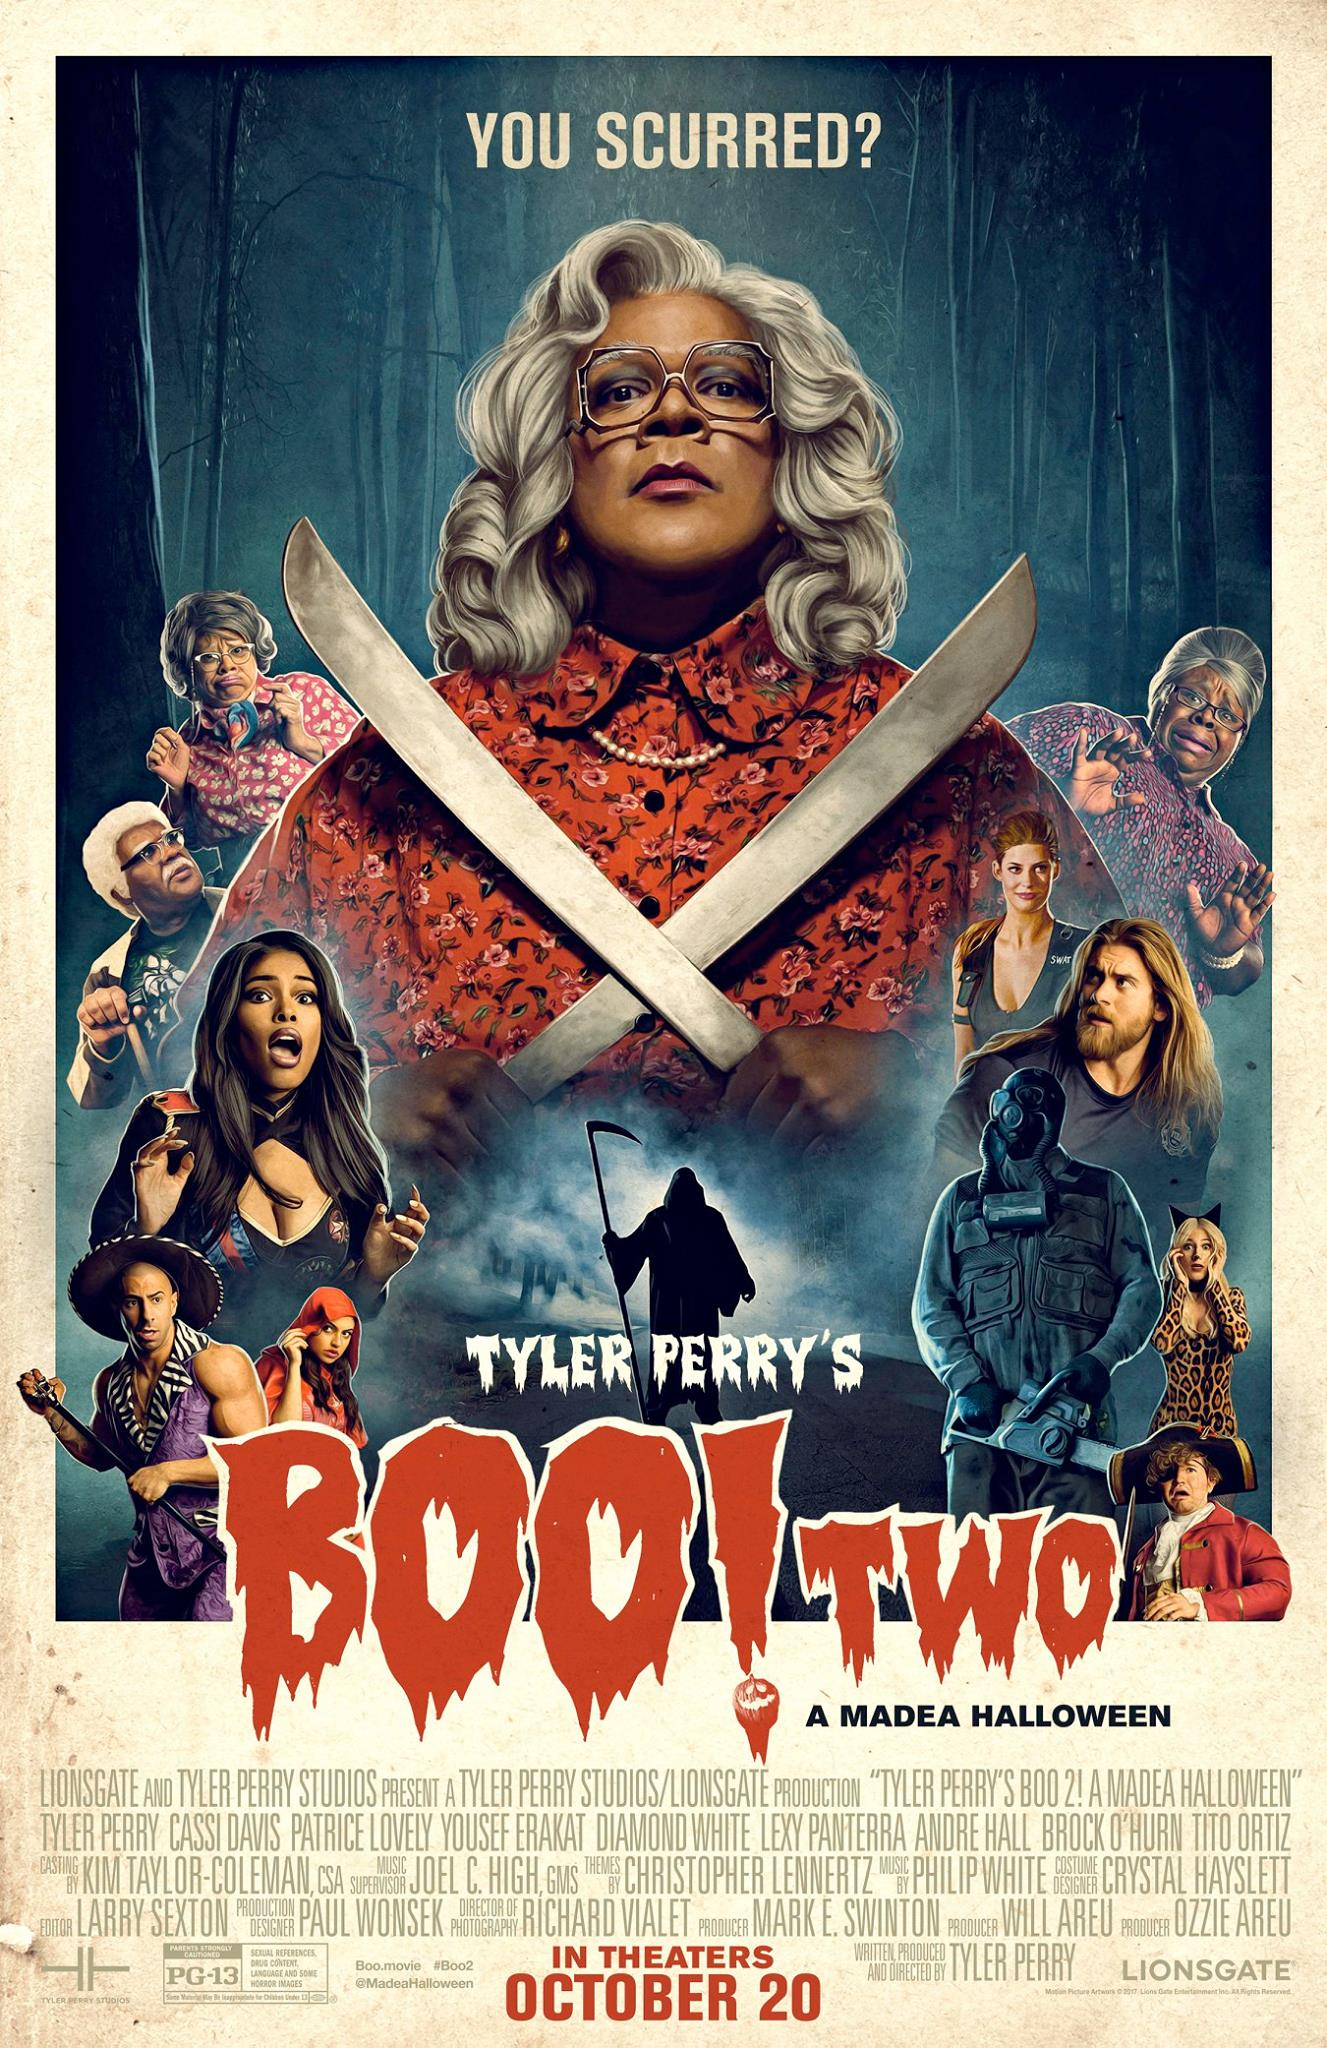 boo-2-a-madea-halloween-poster